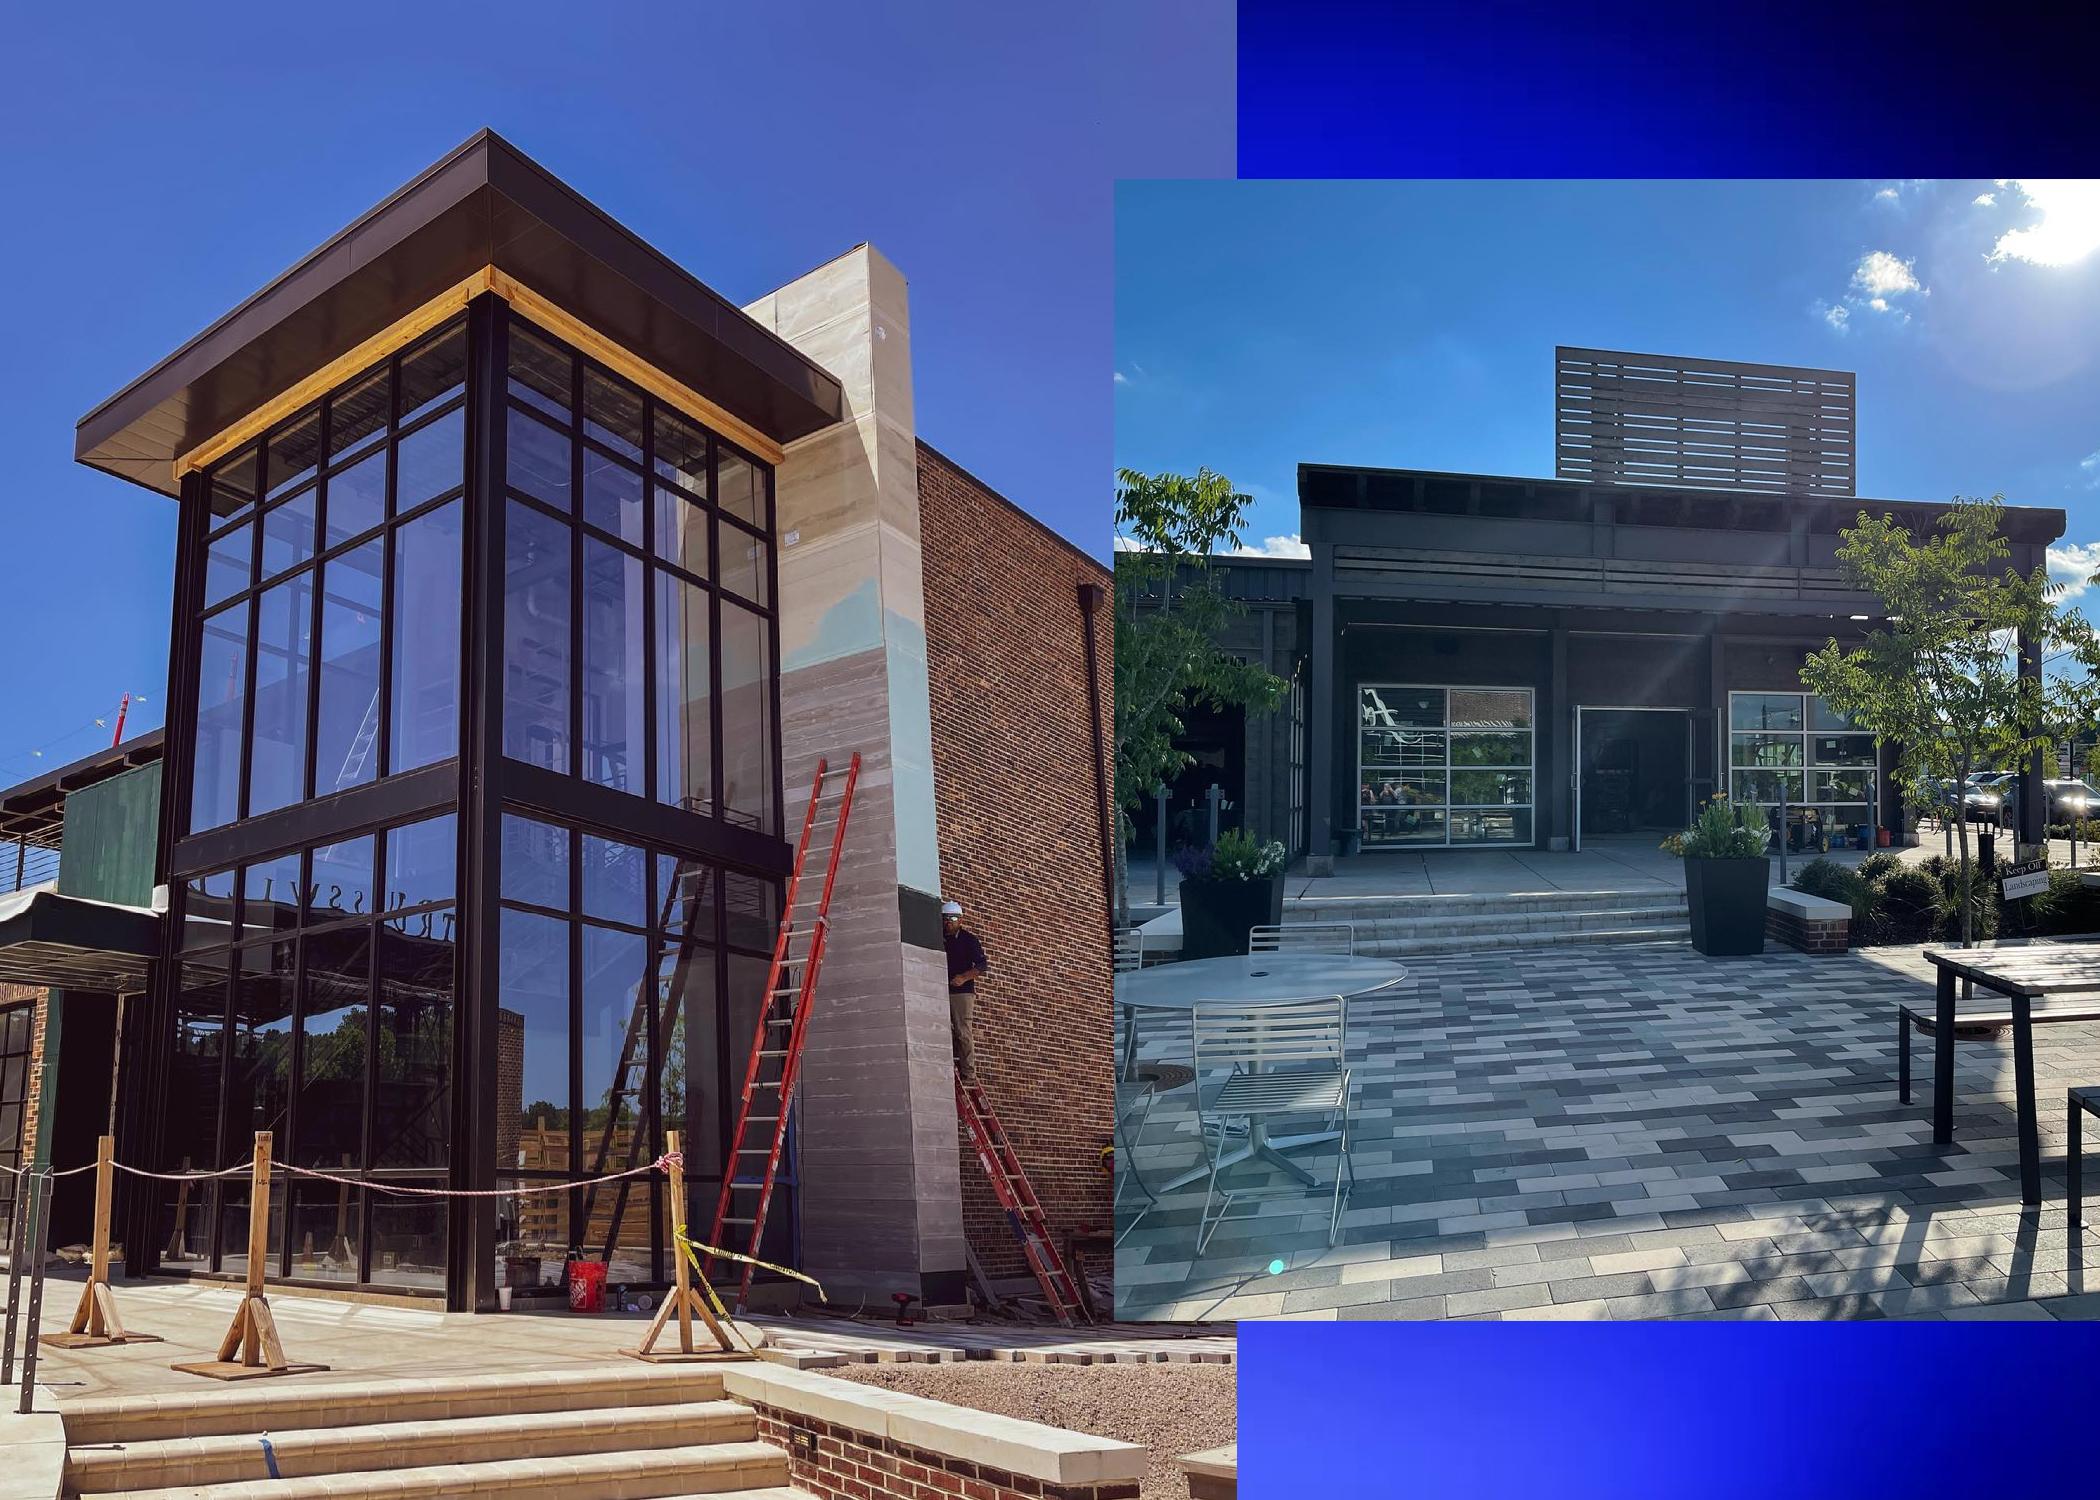 2 new restaurants announced for Trussville Entertainment District